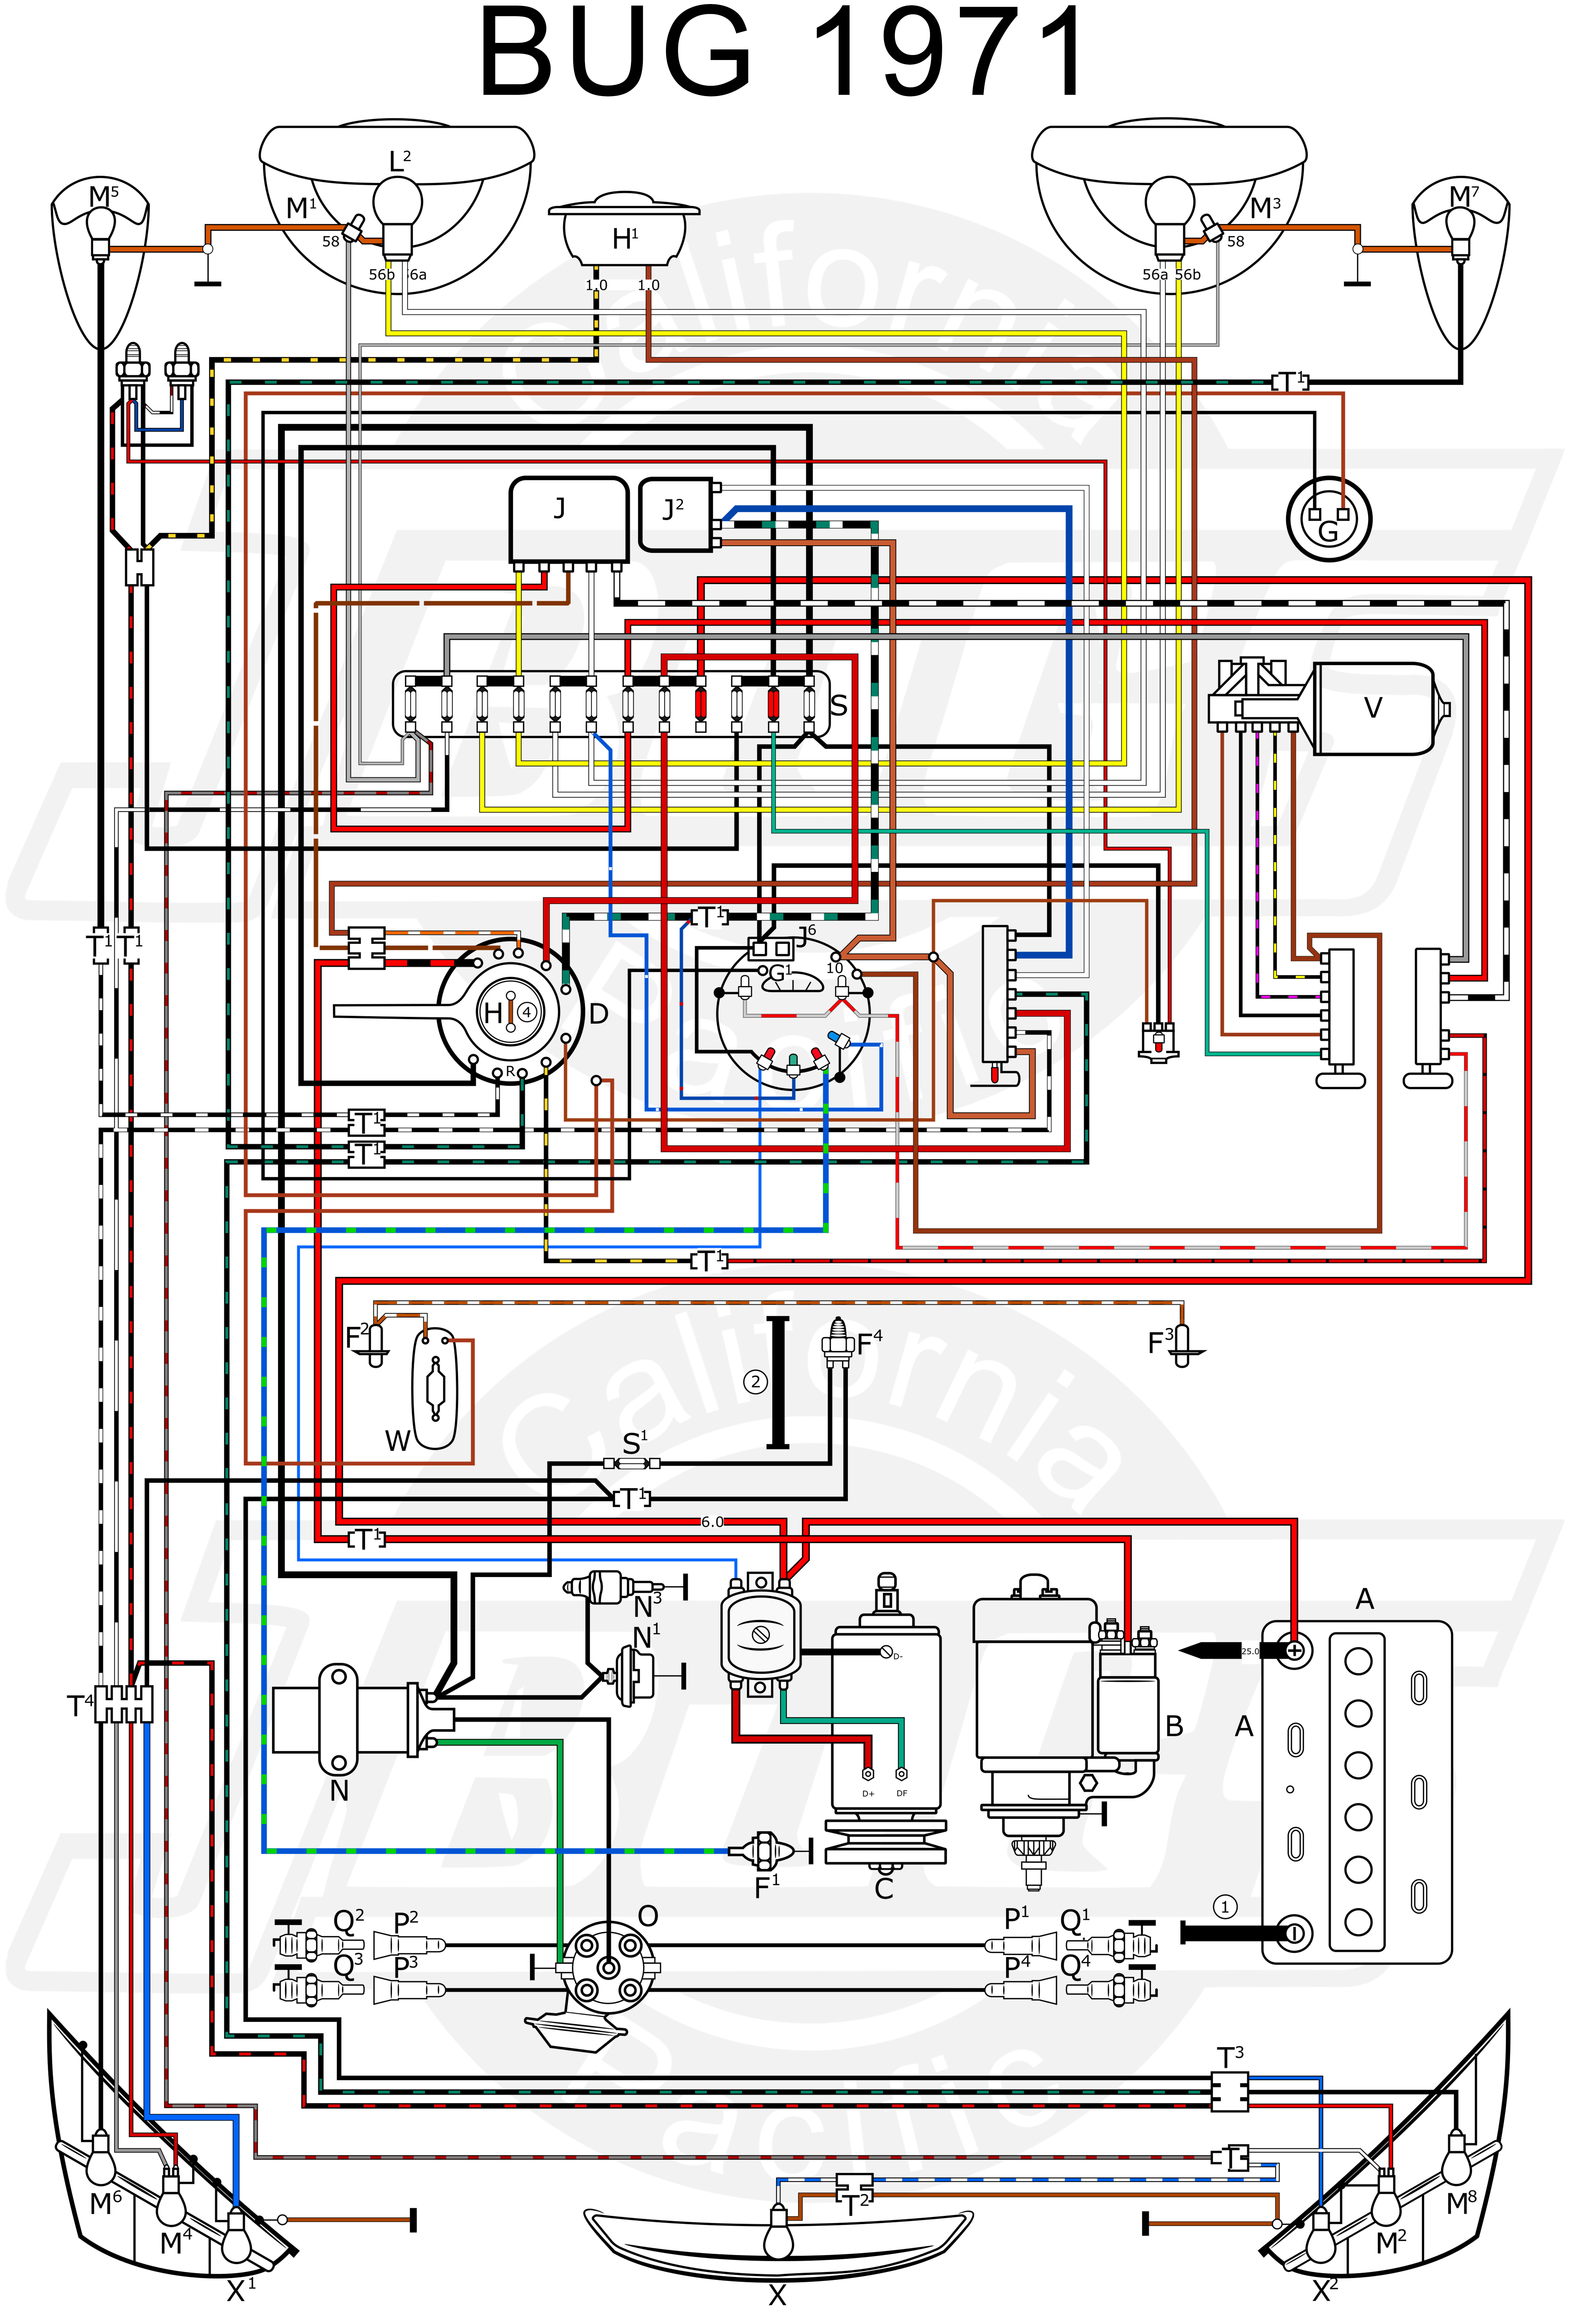 Diagram 71 Volkswagen Wiring Diagram Full Version Hd Quality Wiring Diagram Ritualdiagrams Politopendays It